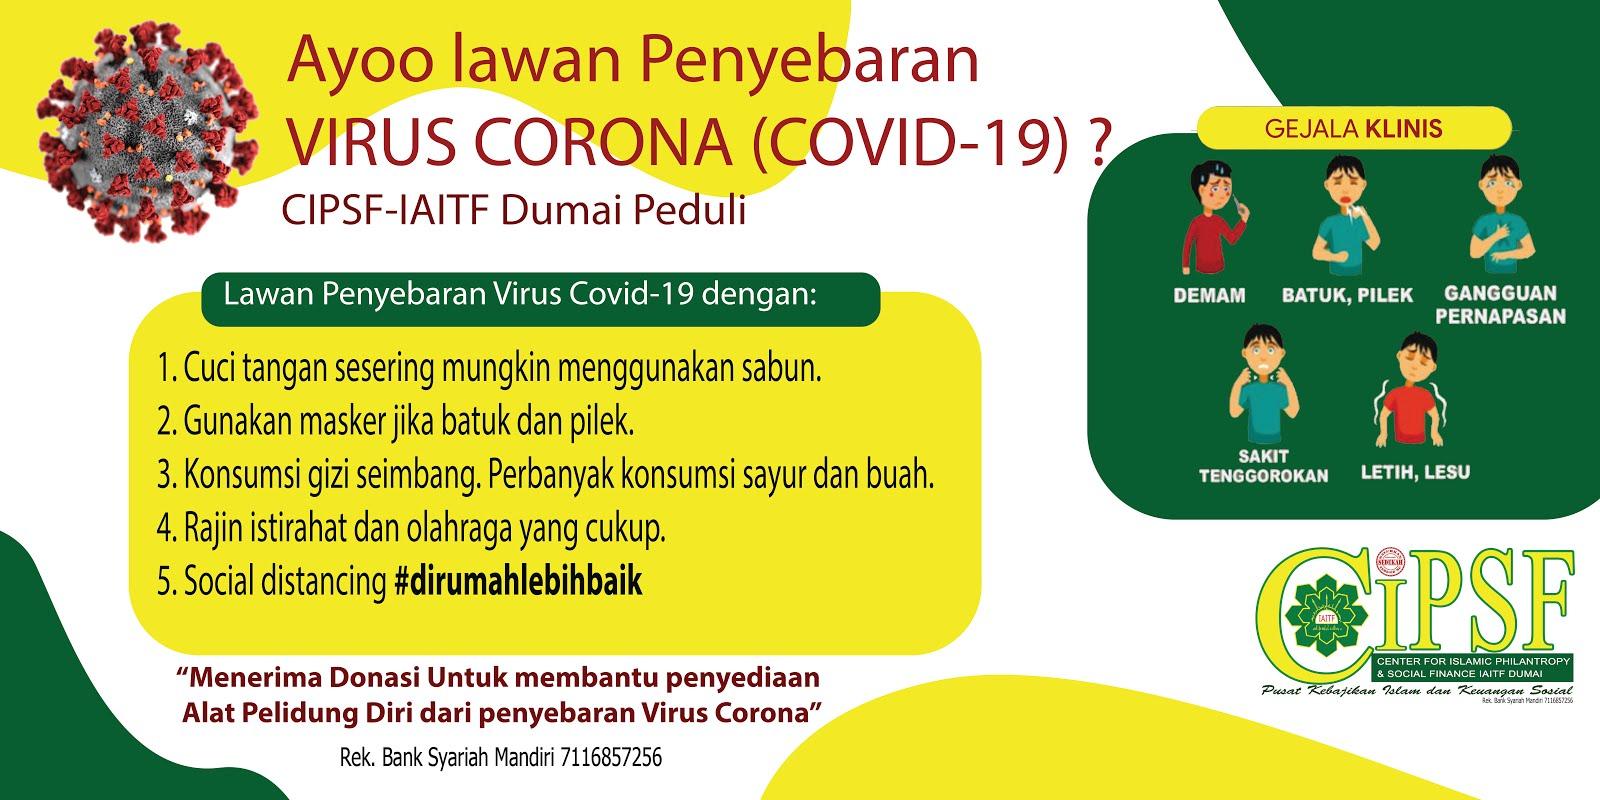 Ayo Lawan Penyebaran Covid-19